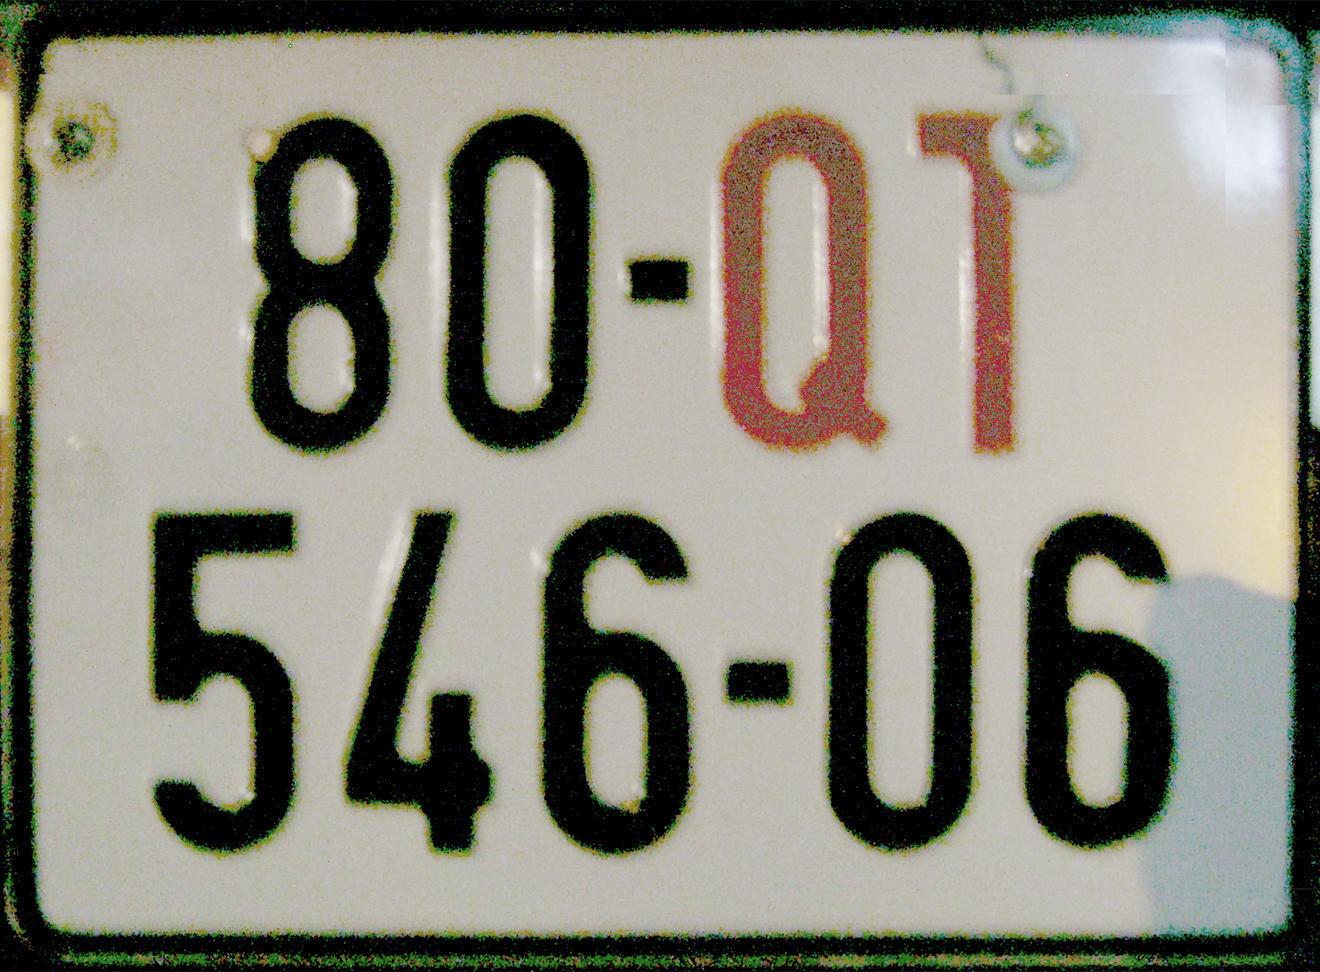 QT - Unidentified type in Saigon, 2008.